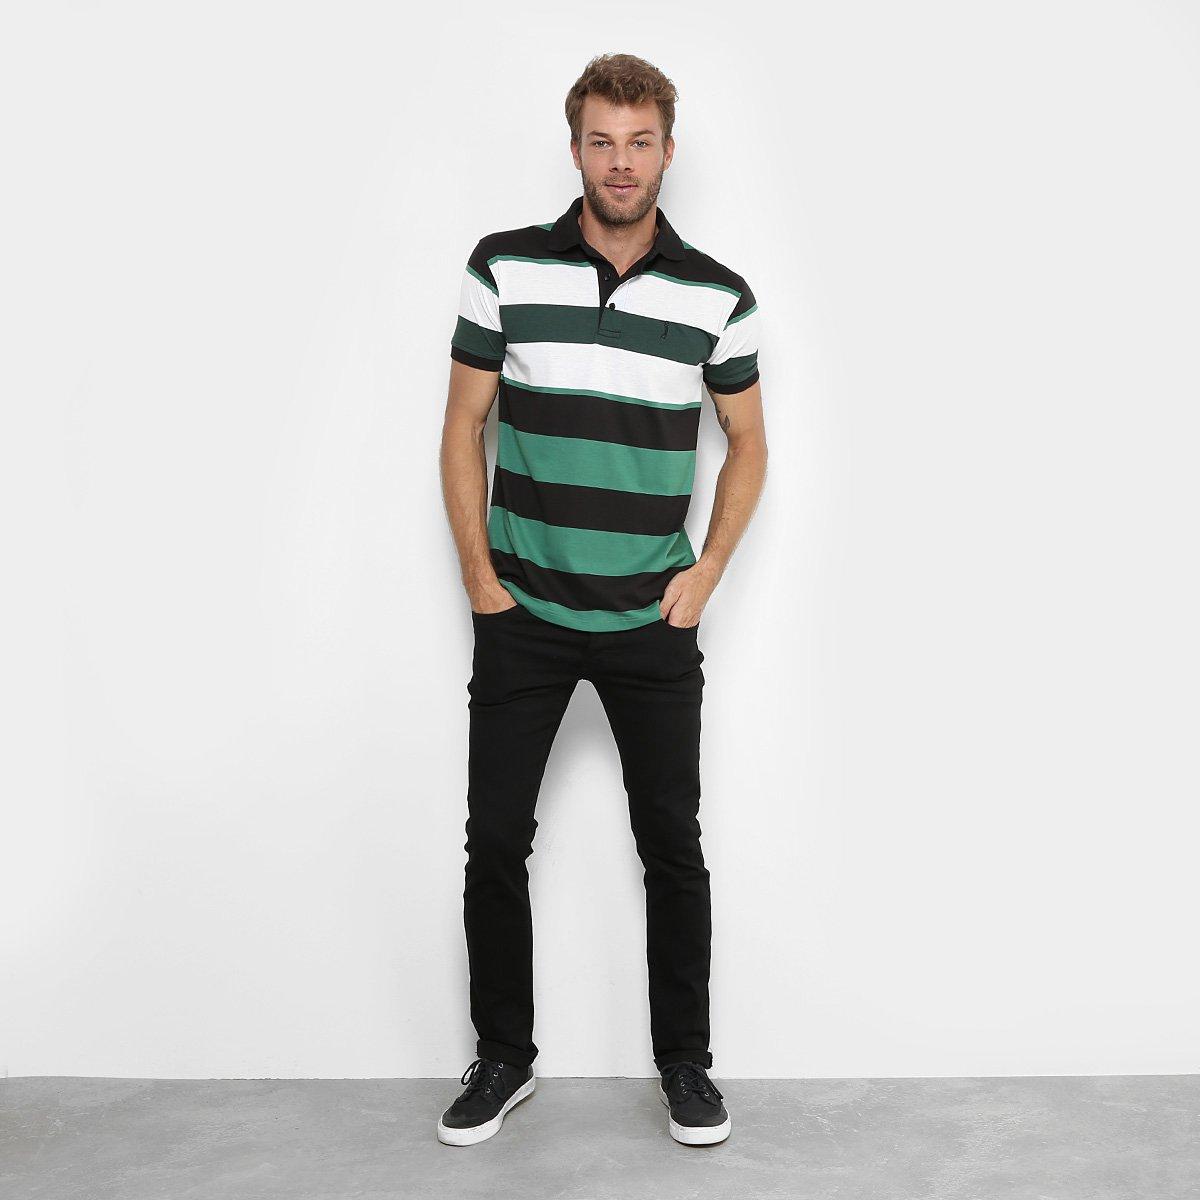 Camisa Polo Aleatory Fio Tinto Listrada Masculina - Compre Agora ... 1d90d46d0d975